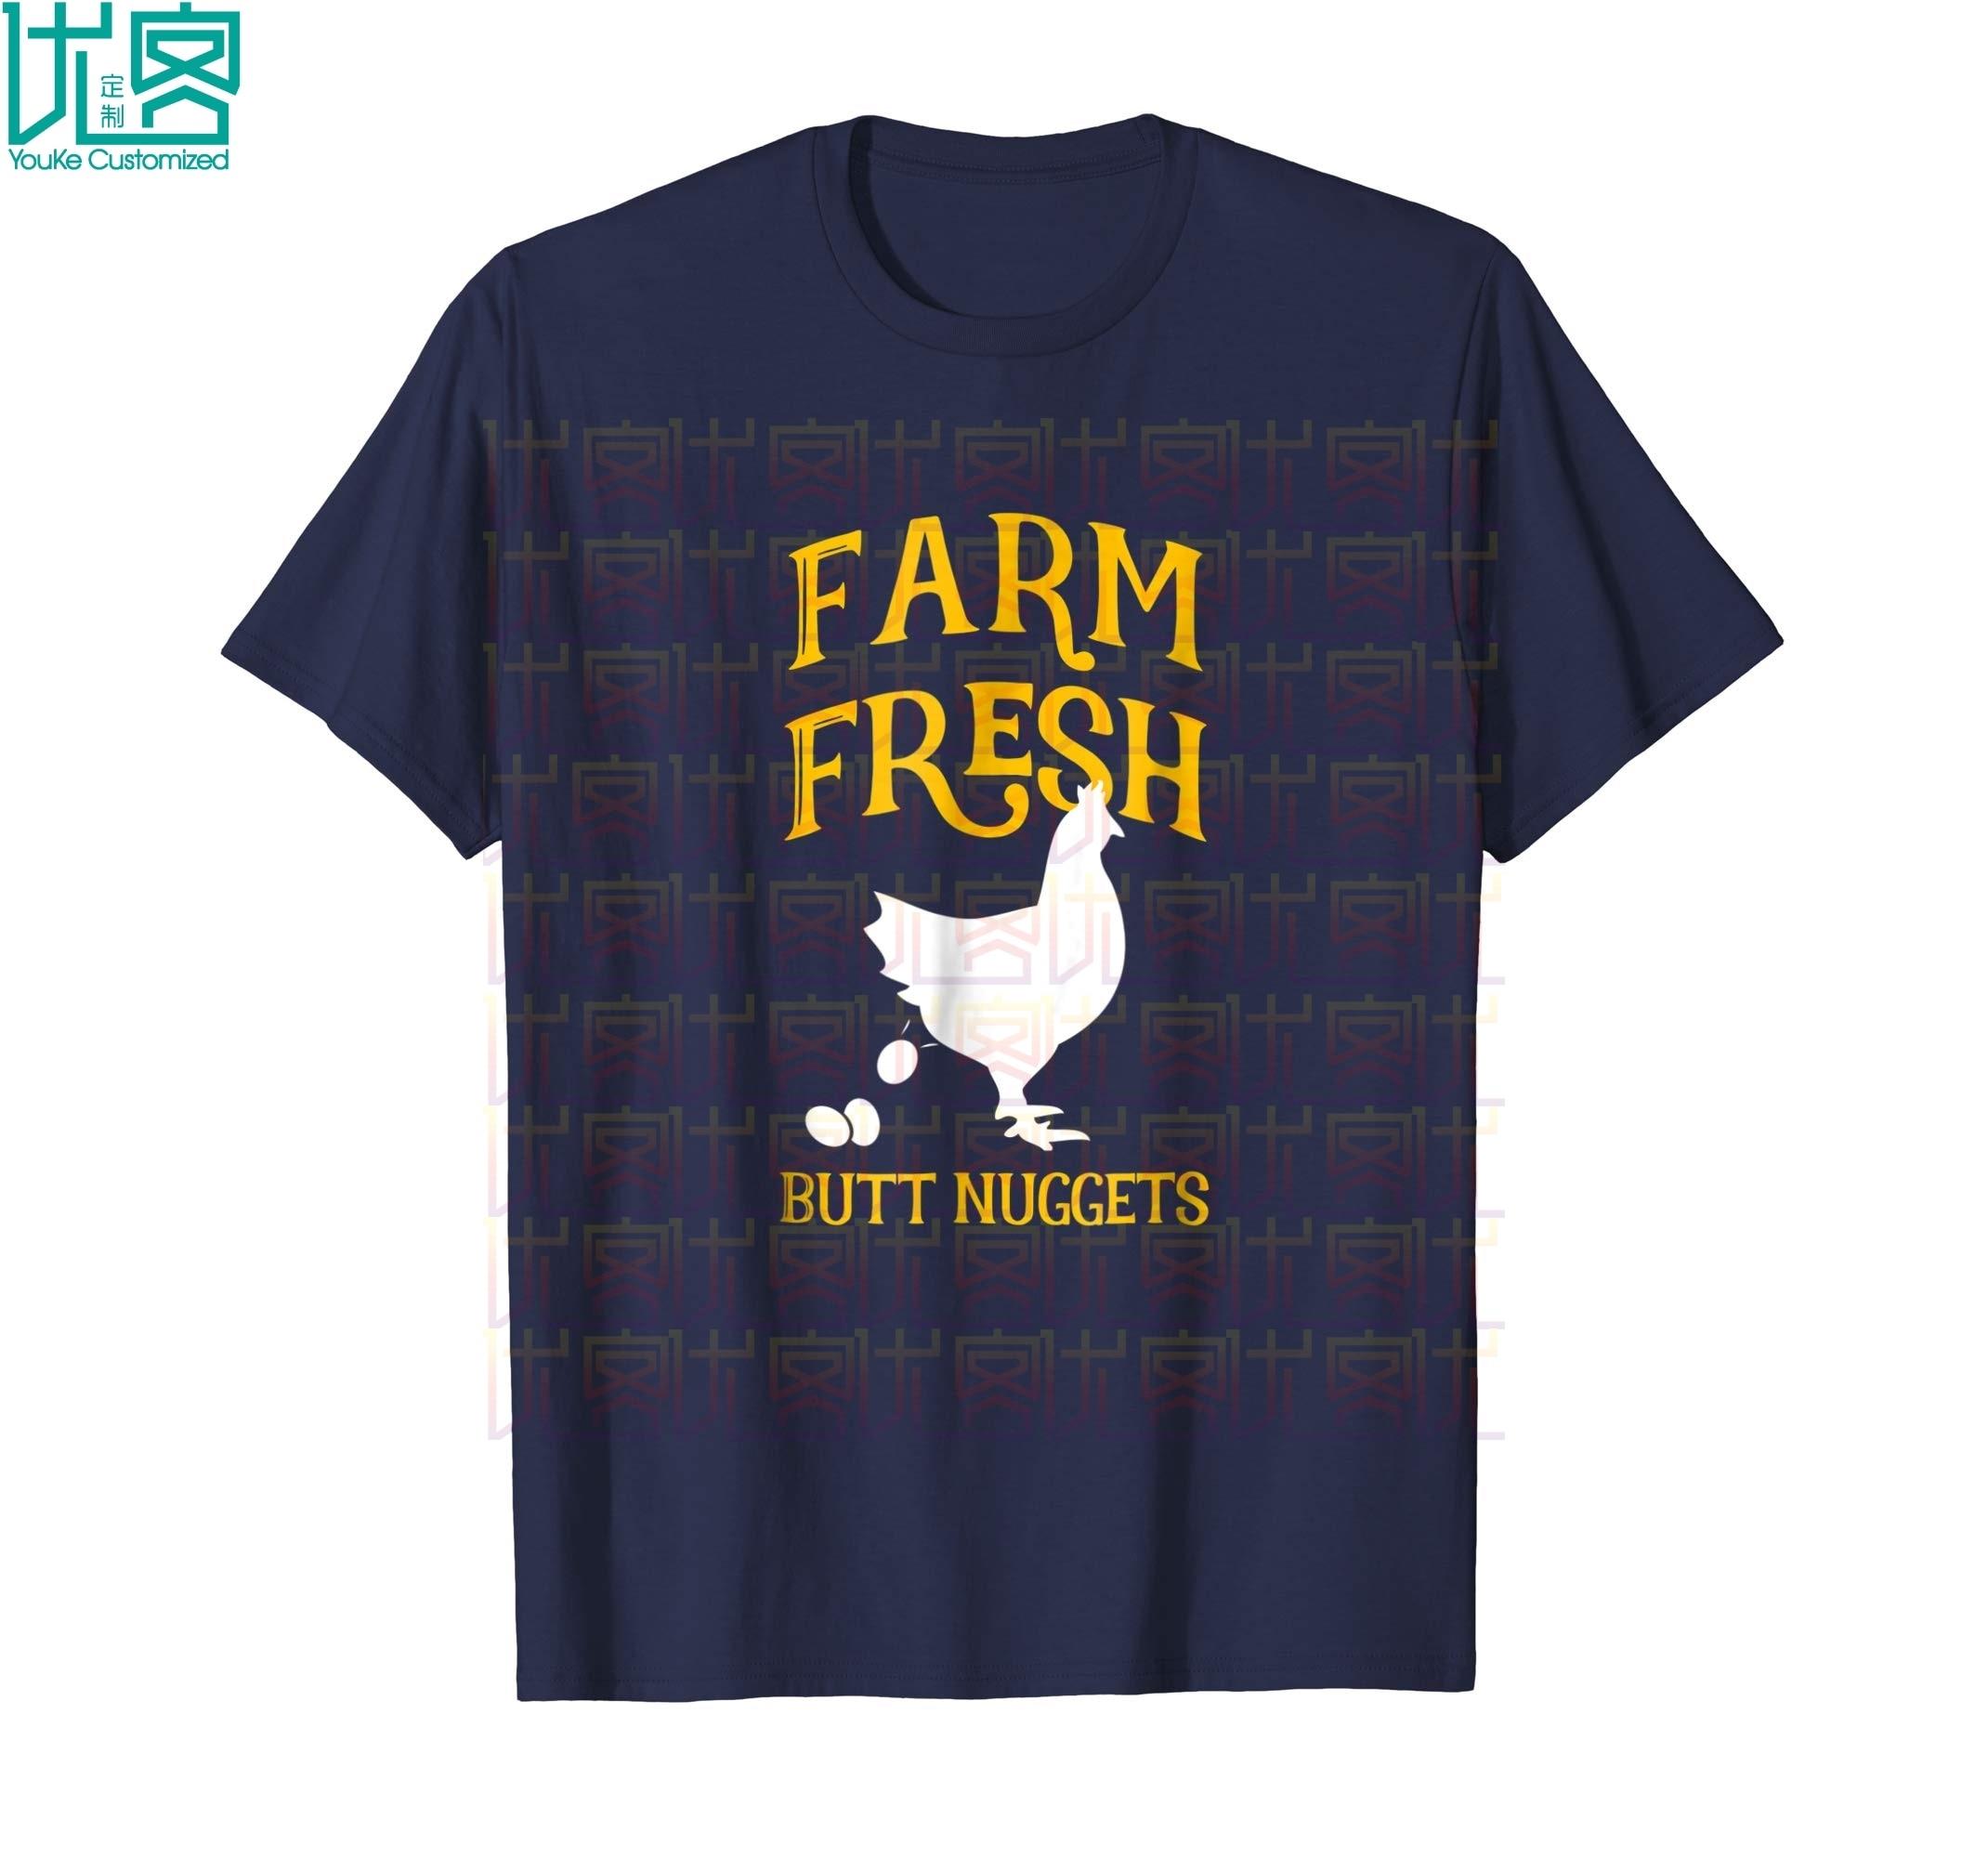 Bauernhof Frische Butt Nuggets Nette Huhn Butt T Hemd Erstaunliche Kurzarm Einzigartige Casual Tees 100% Baumwolle Kleidung T Shirt